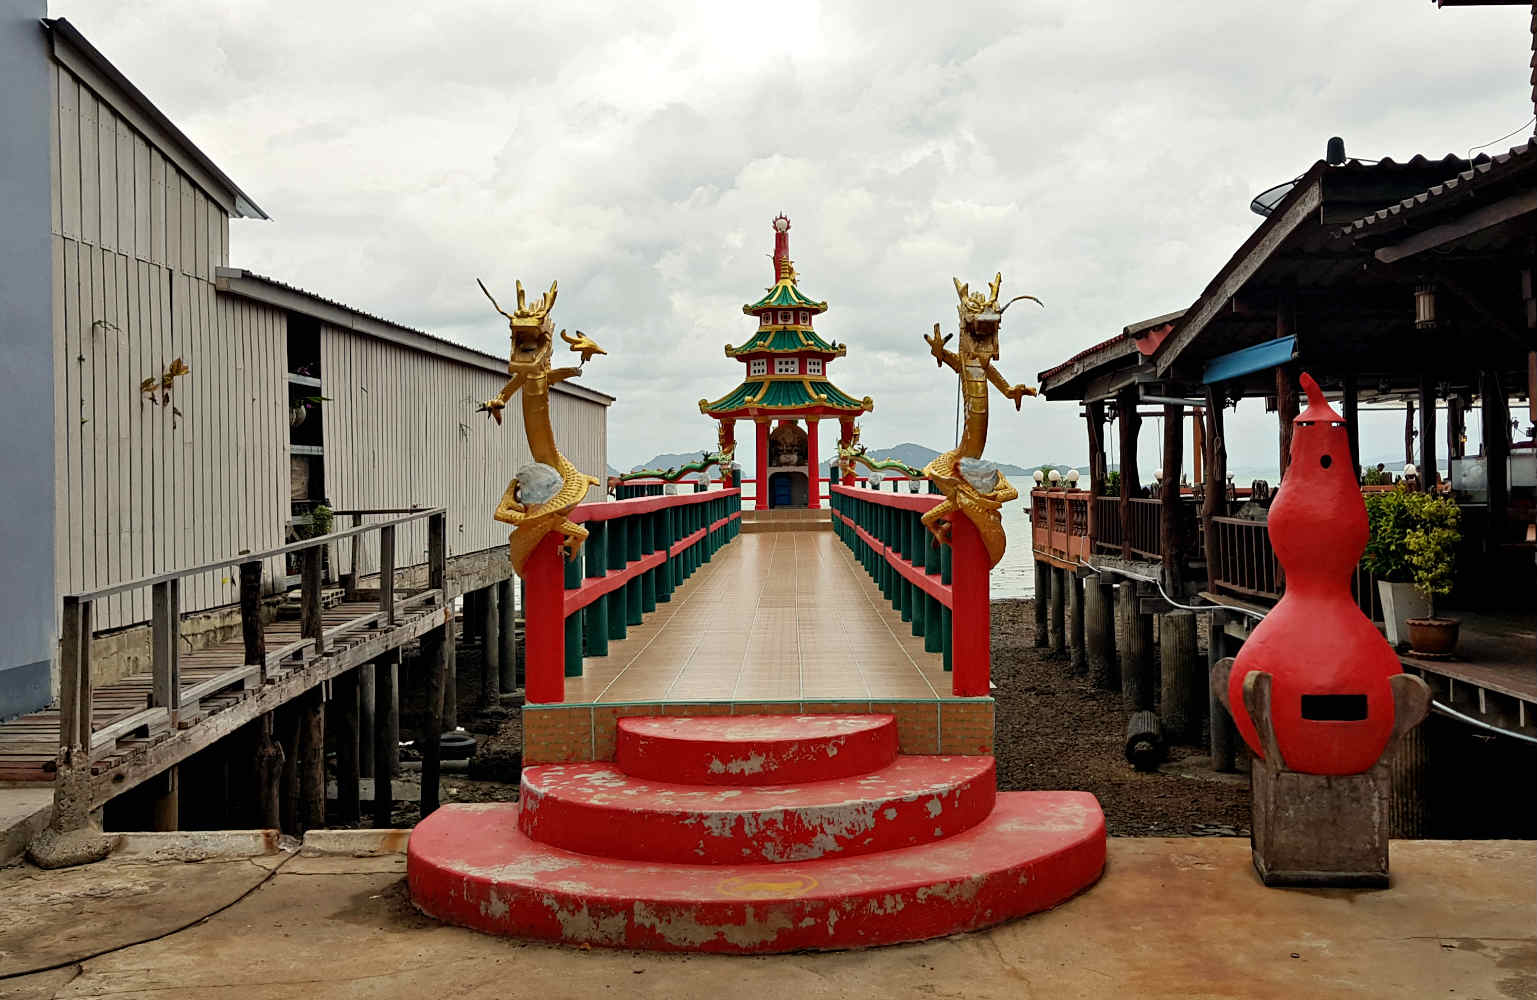 Koh Lanta Old Town Chinese Temple